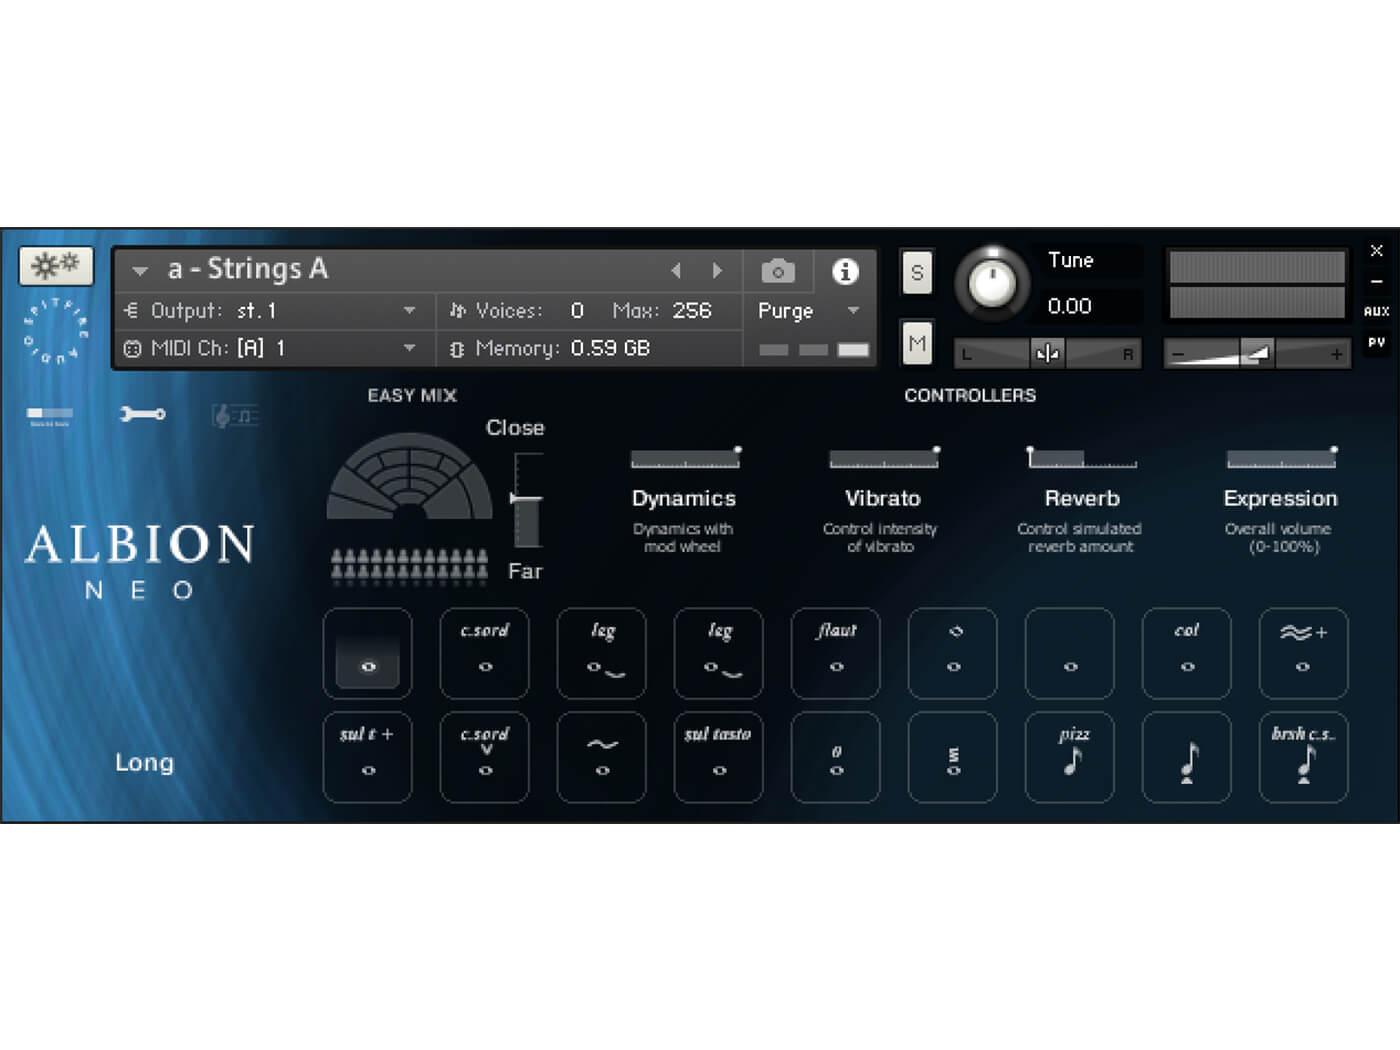 Spitfire Audio Albion Neo GUI